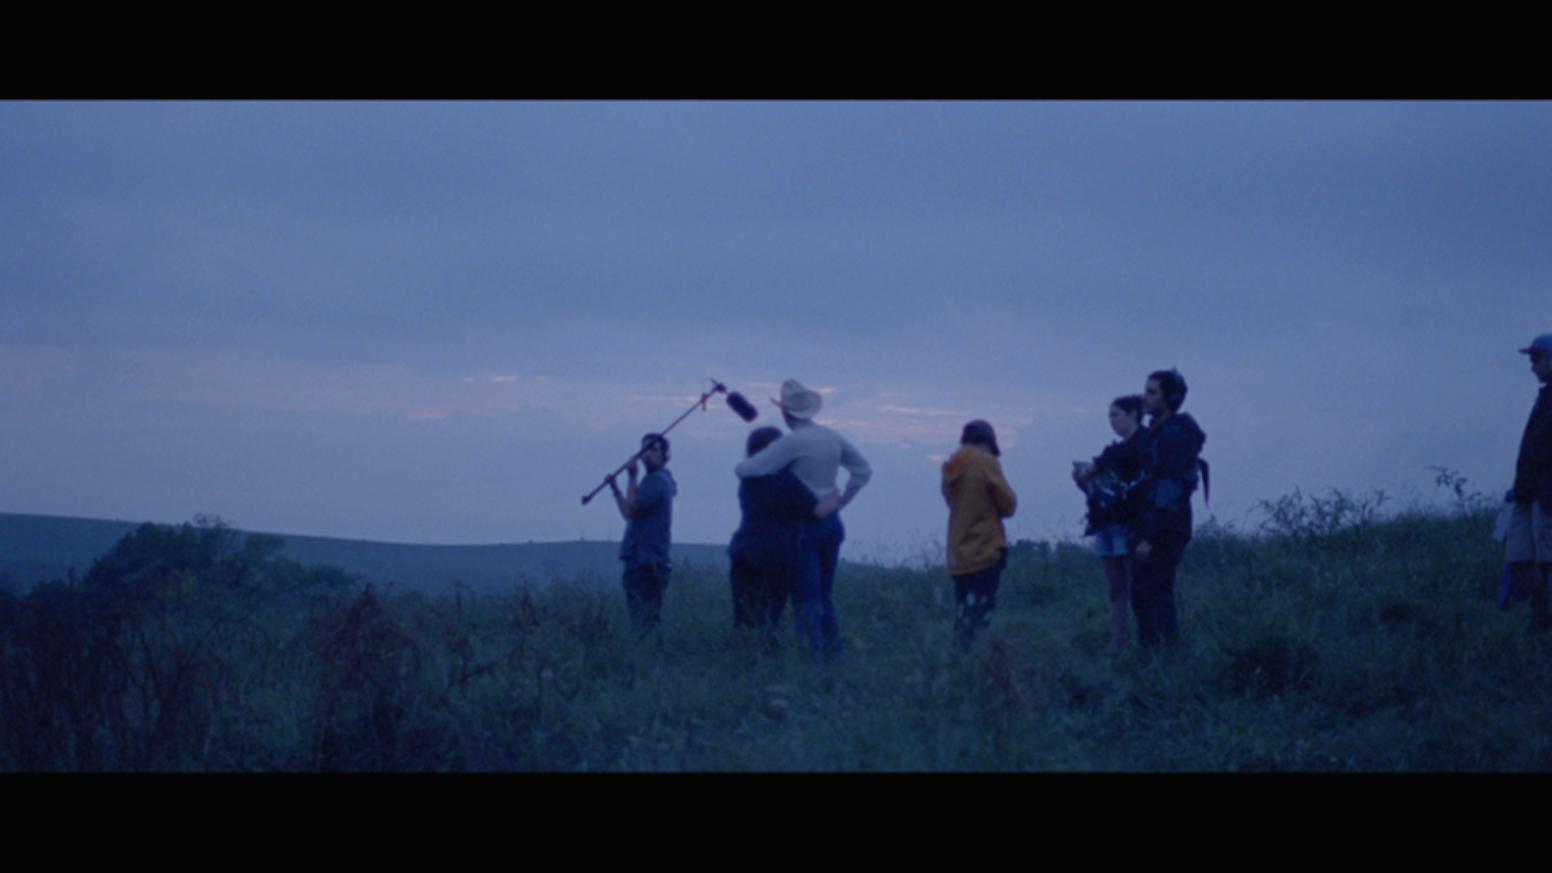 Vimeo — Kickstarter